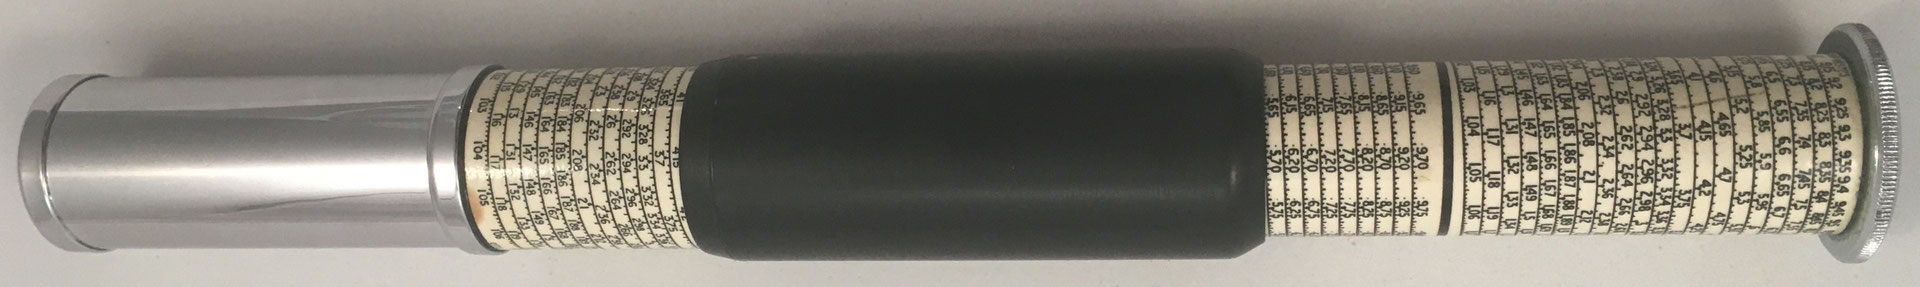 OTIS KING'S Poket Calculator, Modelo L tipo Xb, escalas nº 429 y nº 430, s/n V4466, made in England, año 1963, 3 cm diámetro (longitud: 15 cm cerrada, 26 cm desplegada),  (precio estimado: 100€)